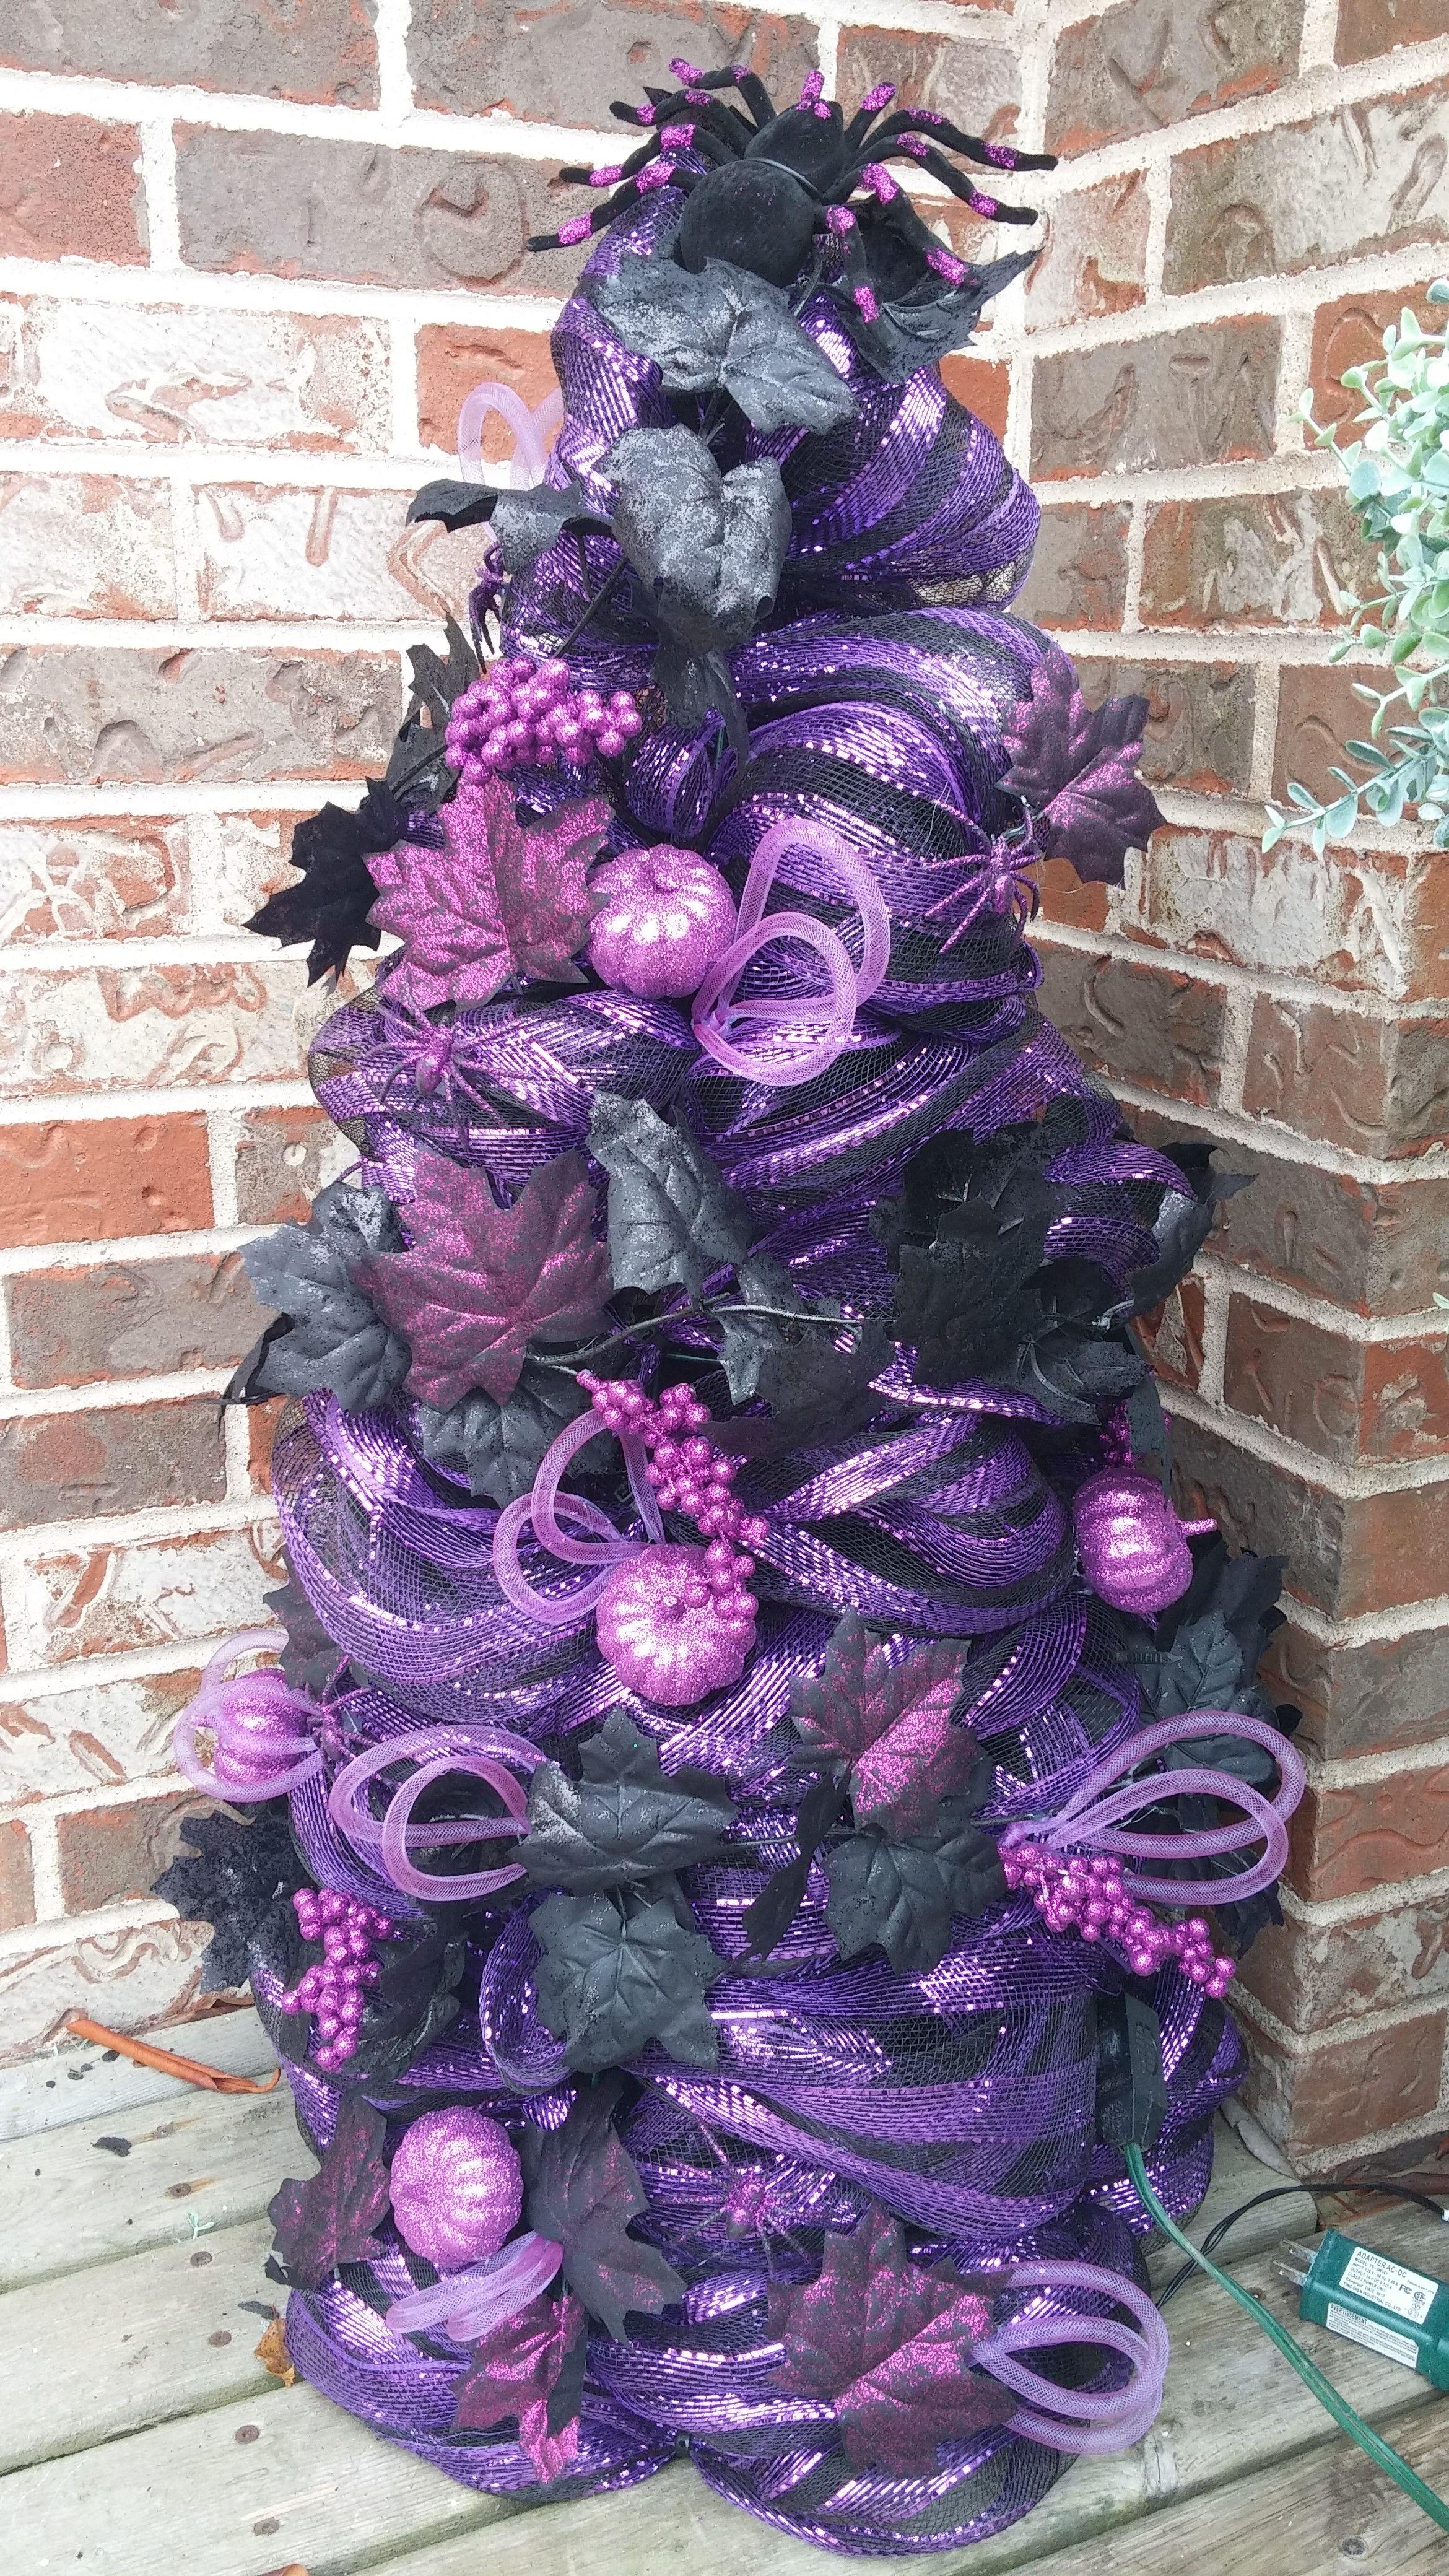 Halloween tree madepurple/black mesh wrapped around tomato cage - halloween tree decoration